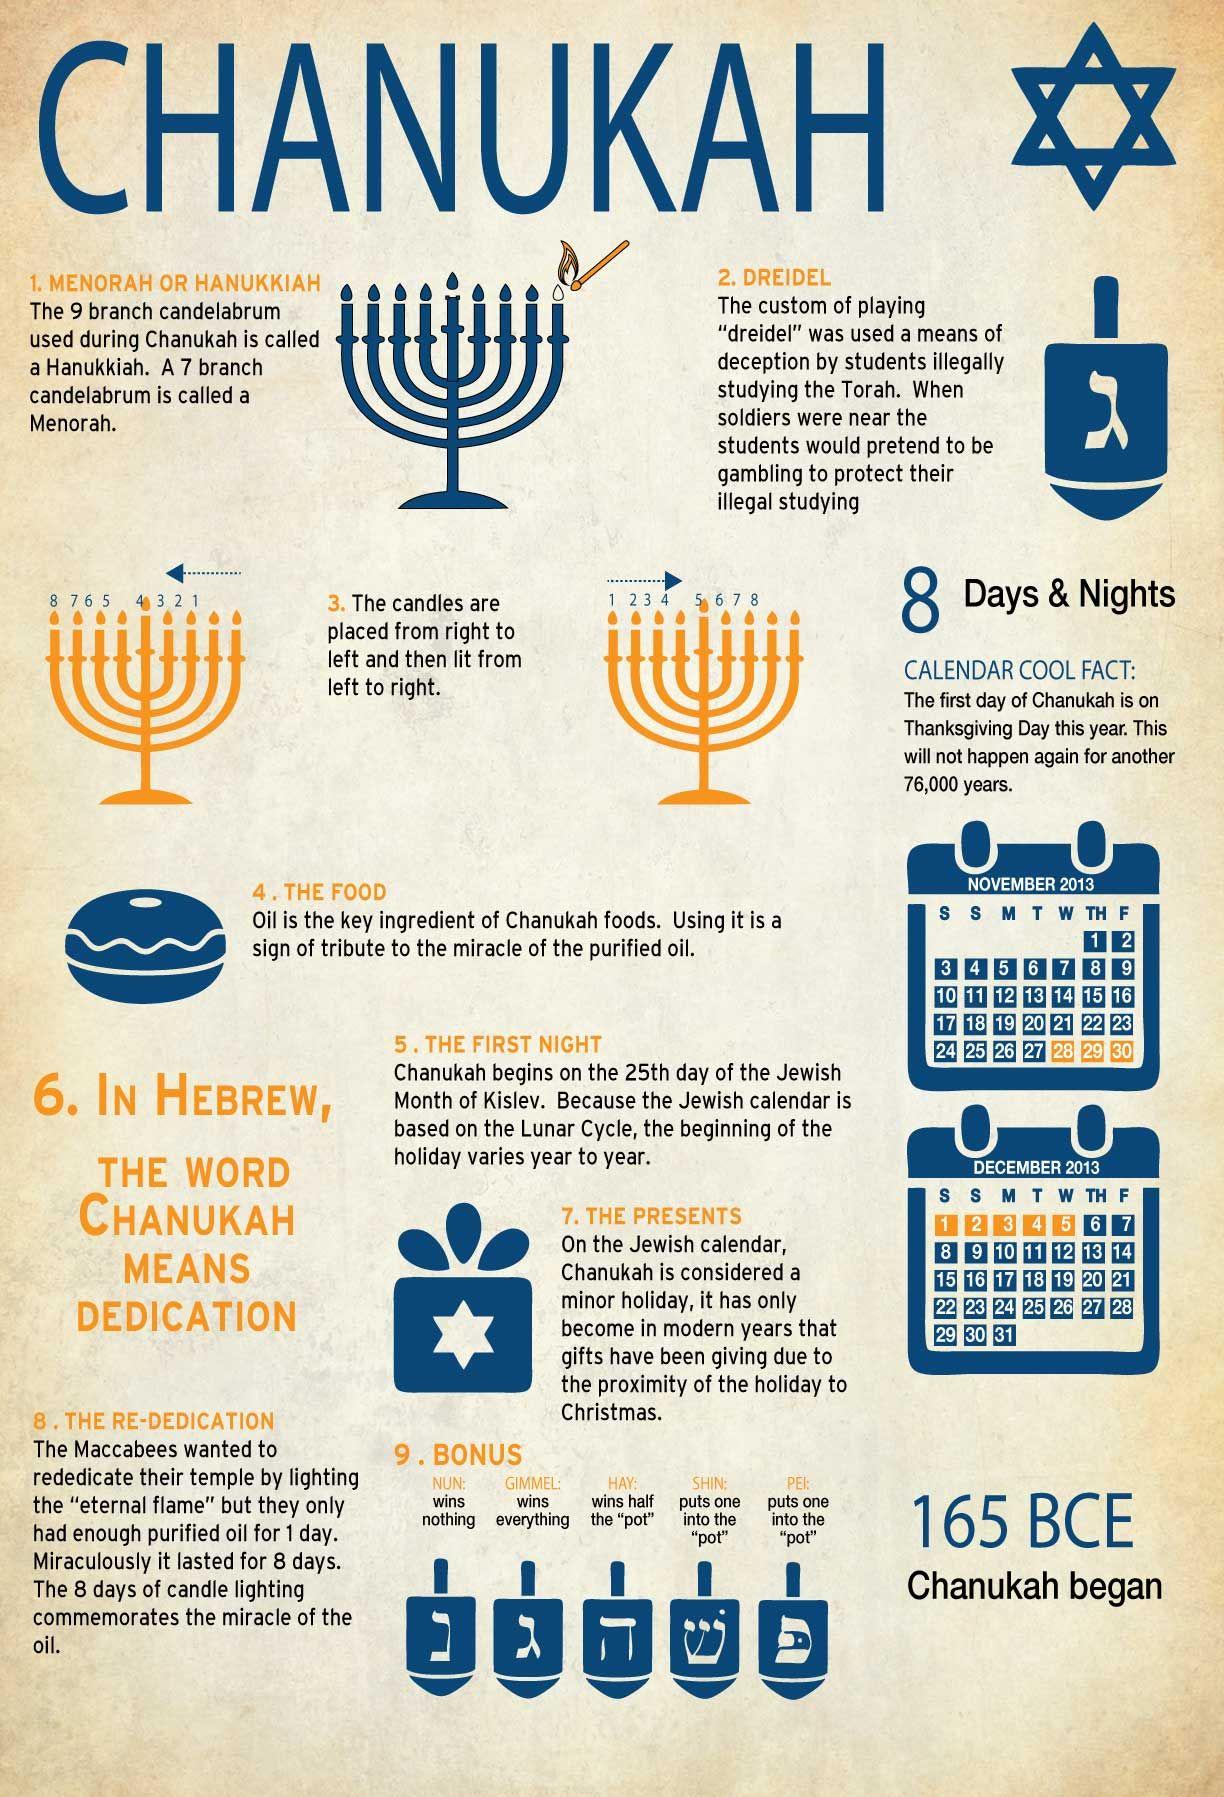 Chanukah Infographic